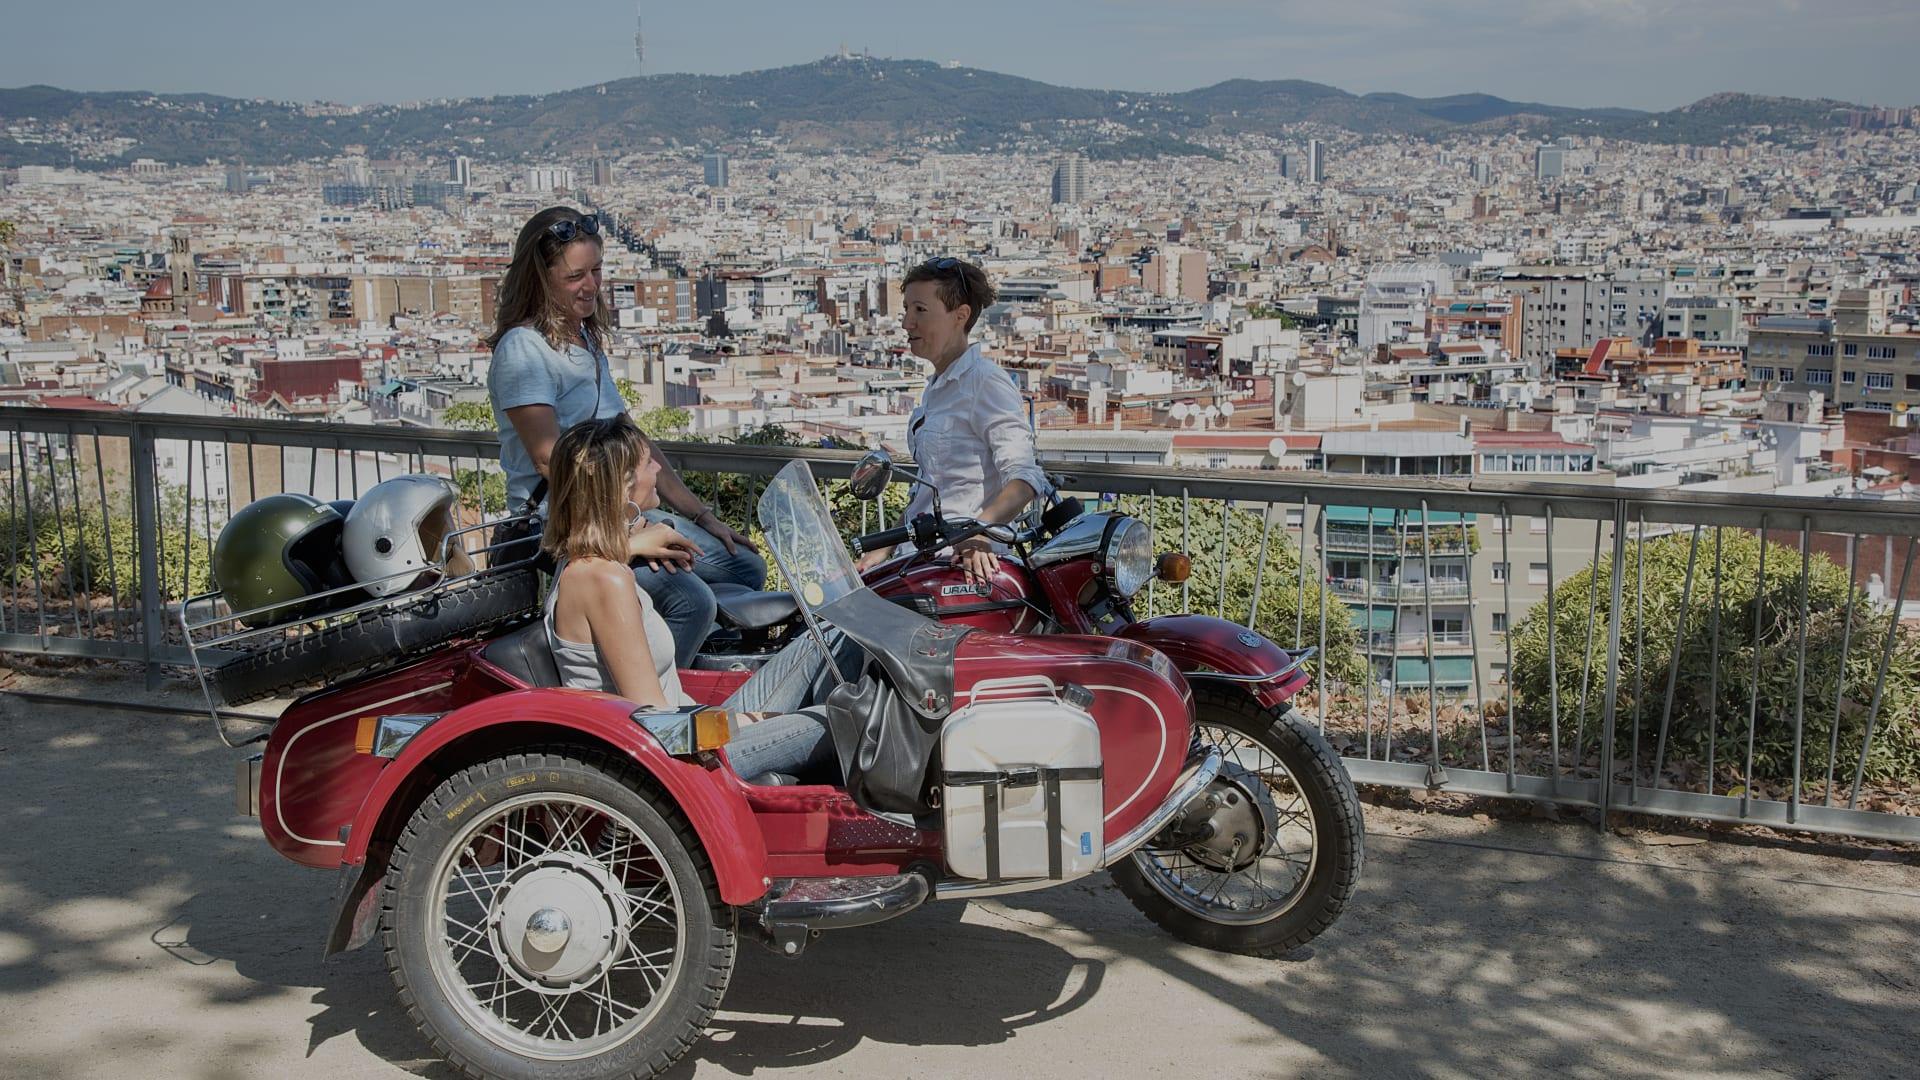 Sidecar Ride App >> Vintage Sidecar Motorcycle Tour Through Barcelona